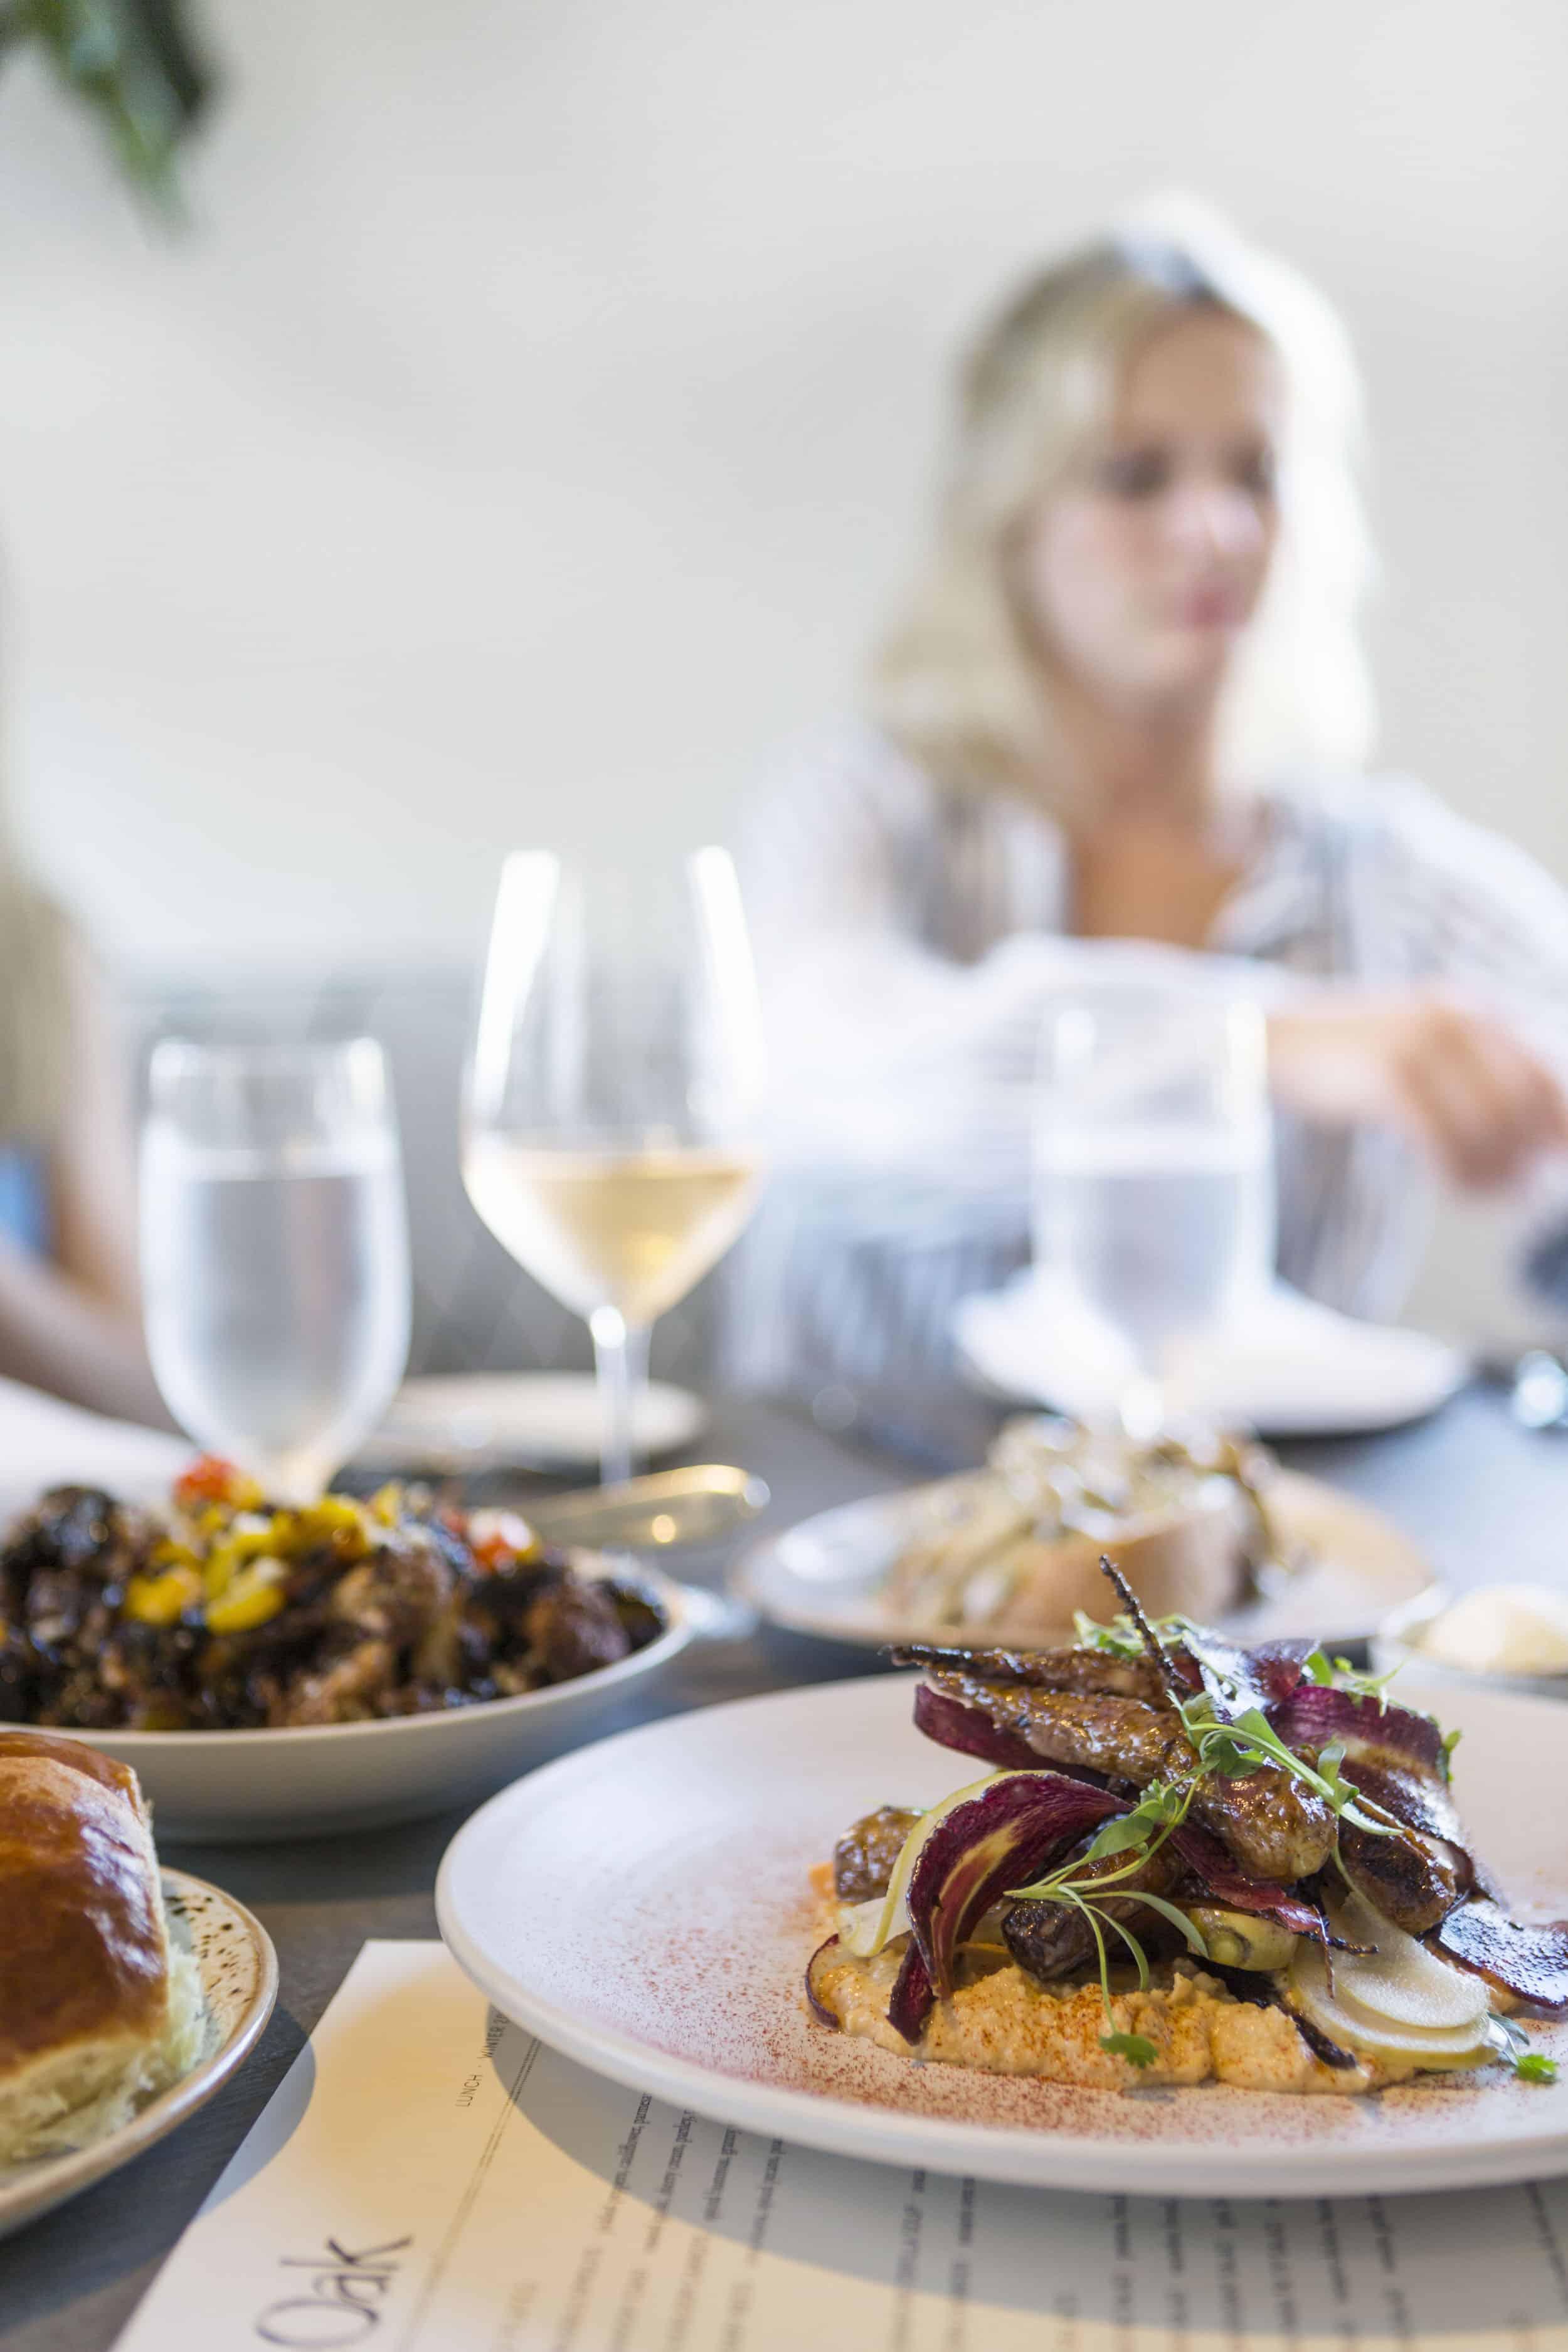 Dining At The Ojai Valley Inn Food And Menu